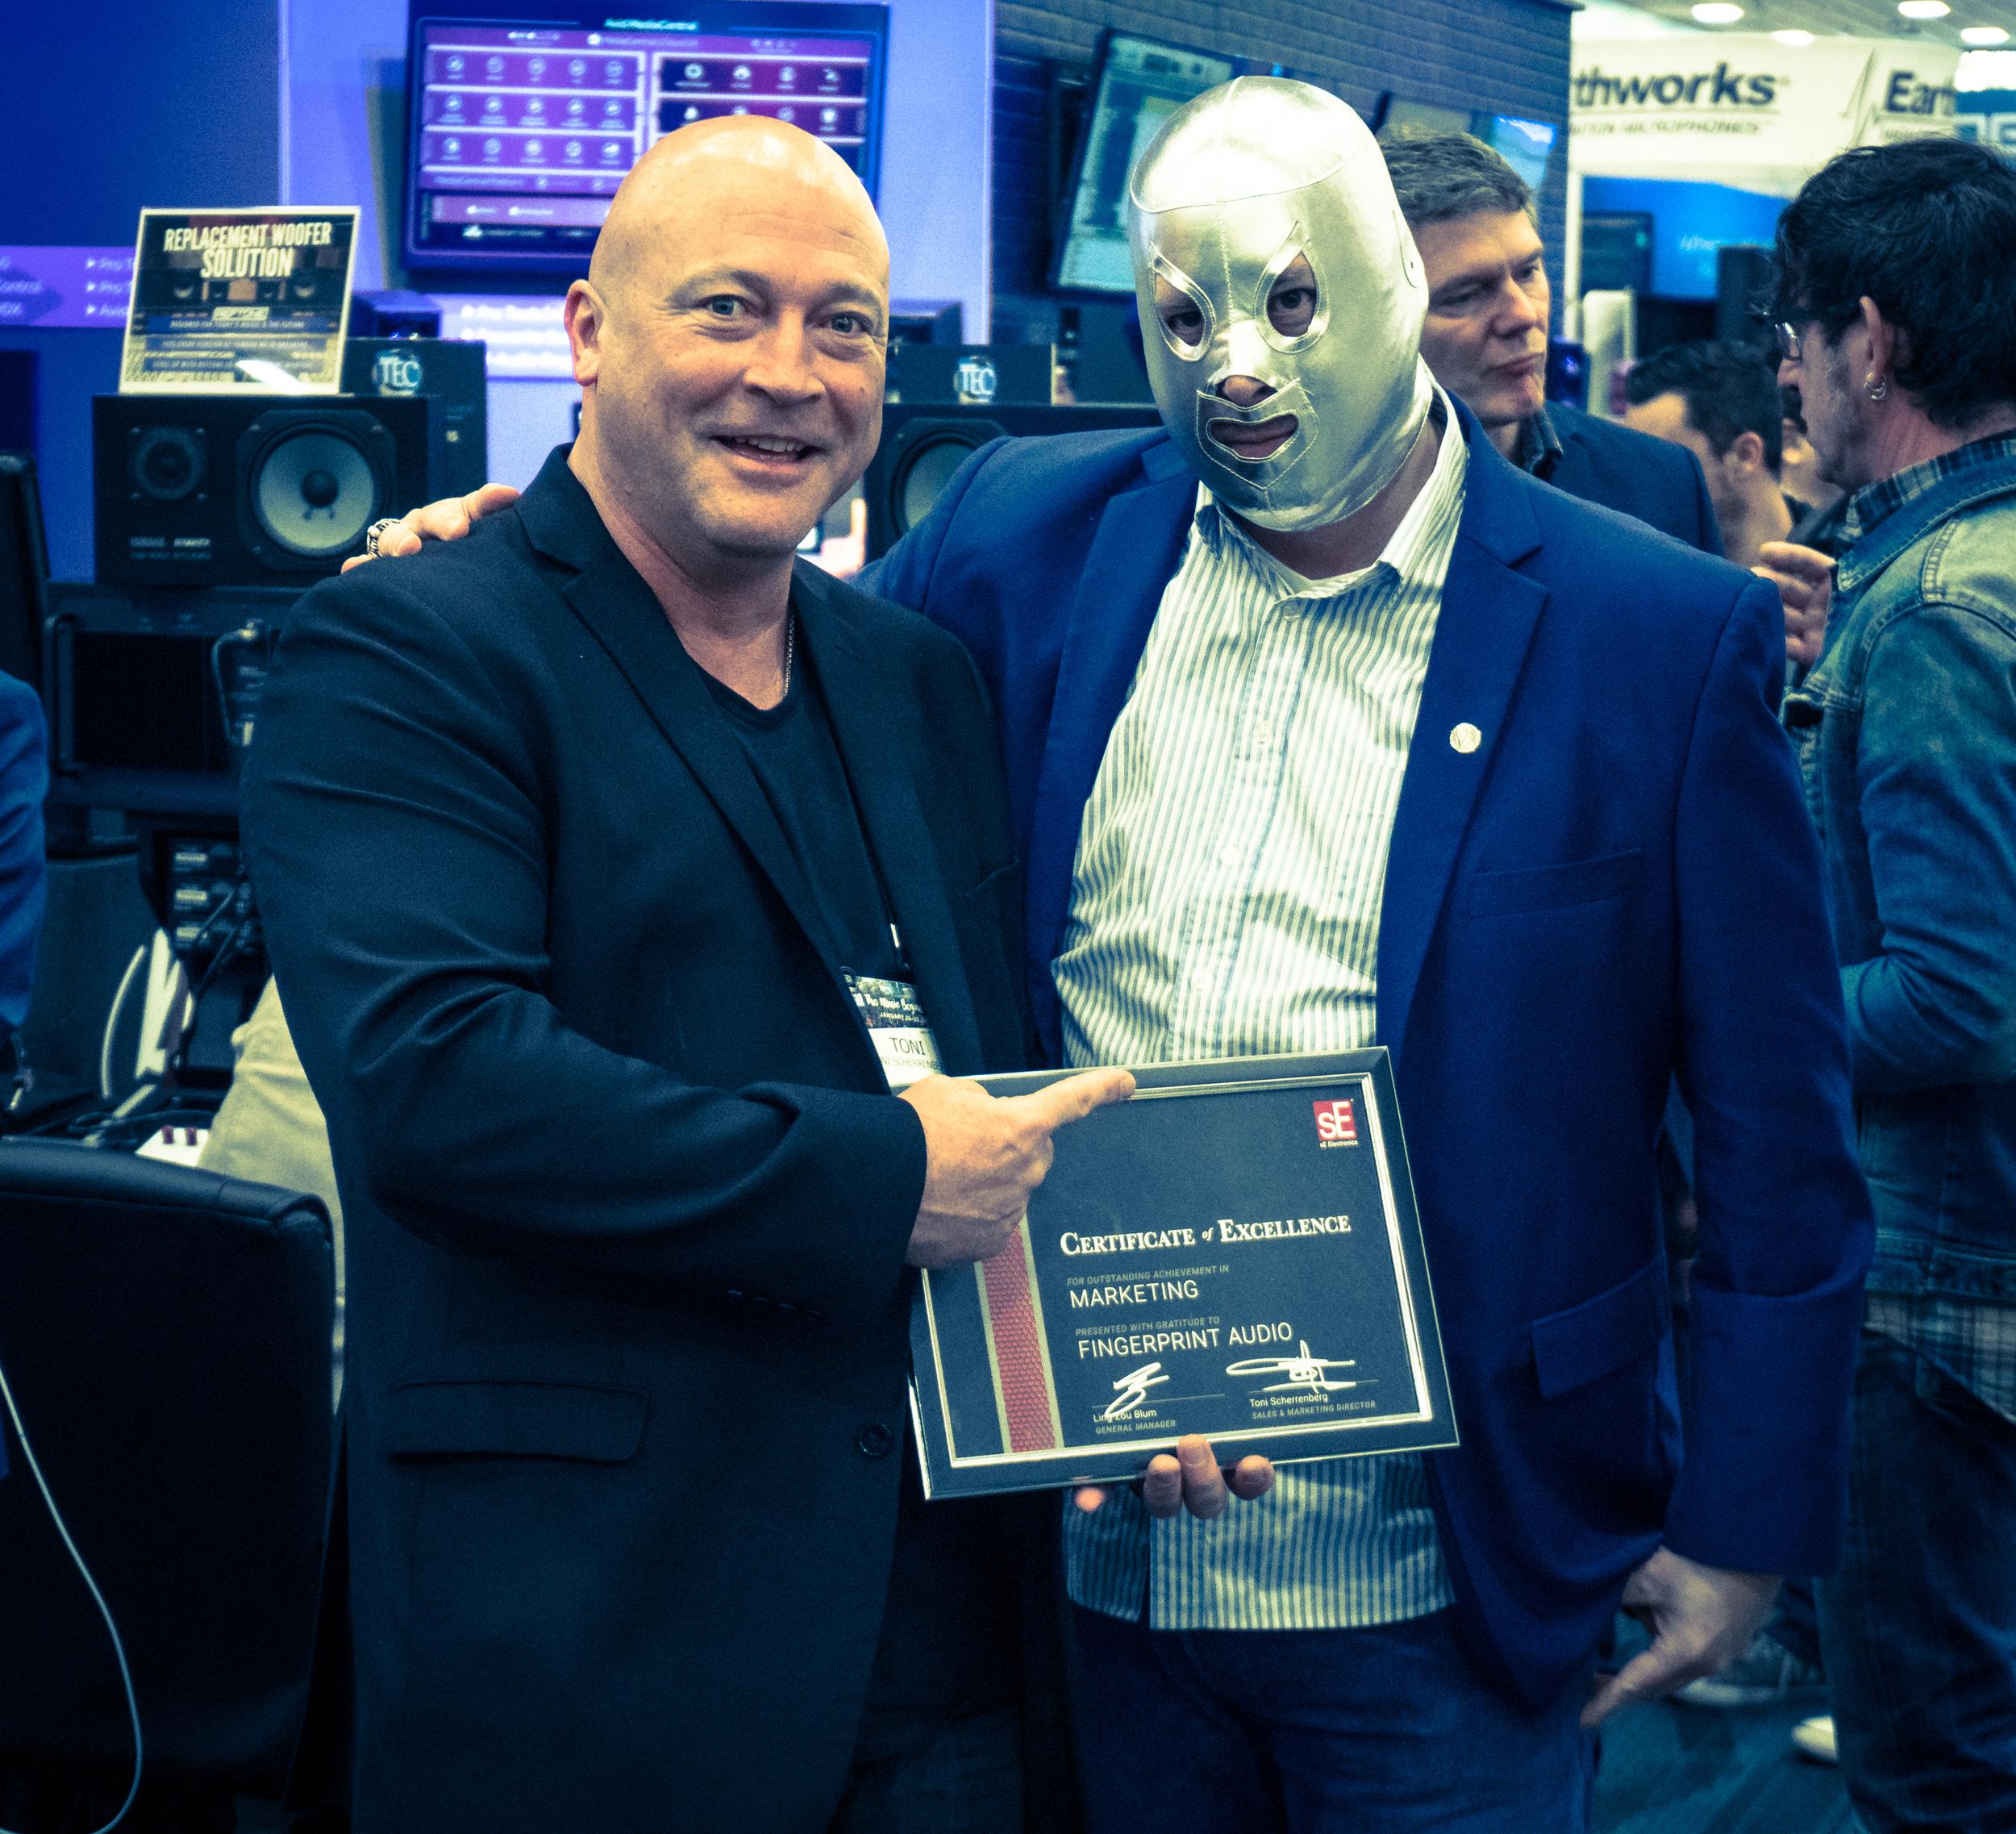 Fingerprint Audio: Marketing Award